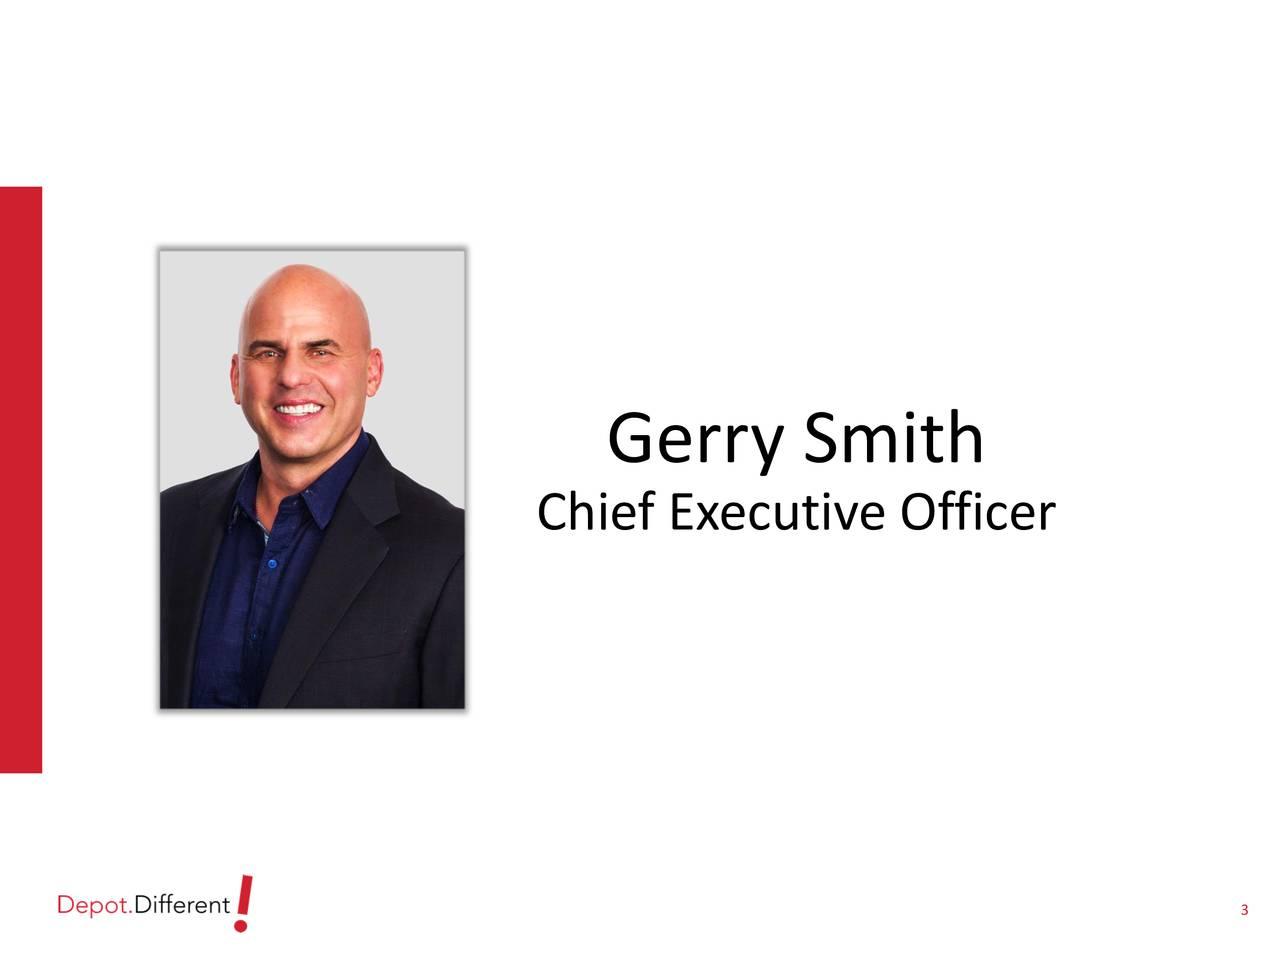 Gerry Smith